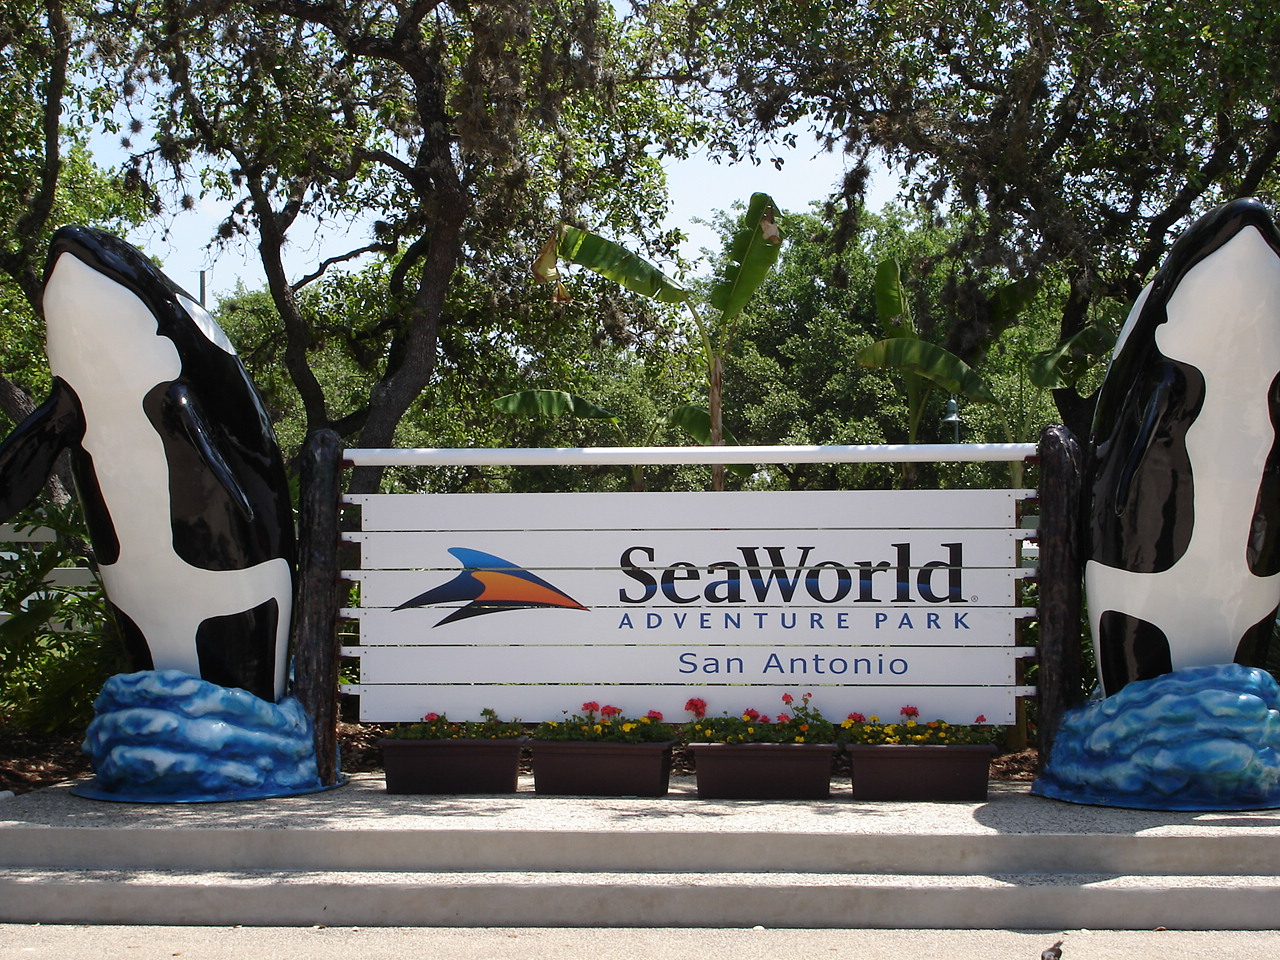 Seaworld san antonio discount tickets coupons